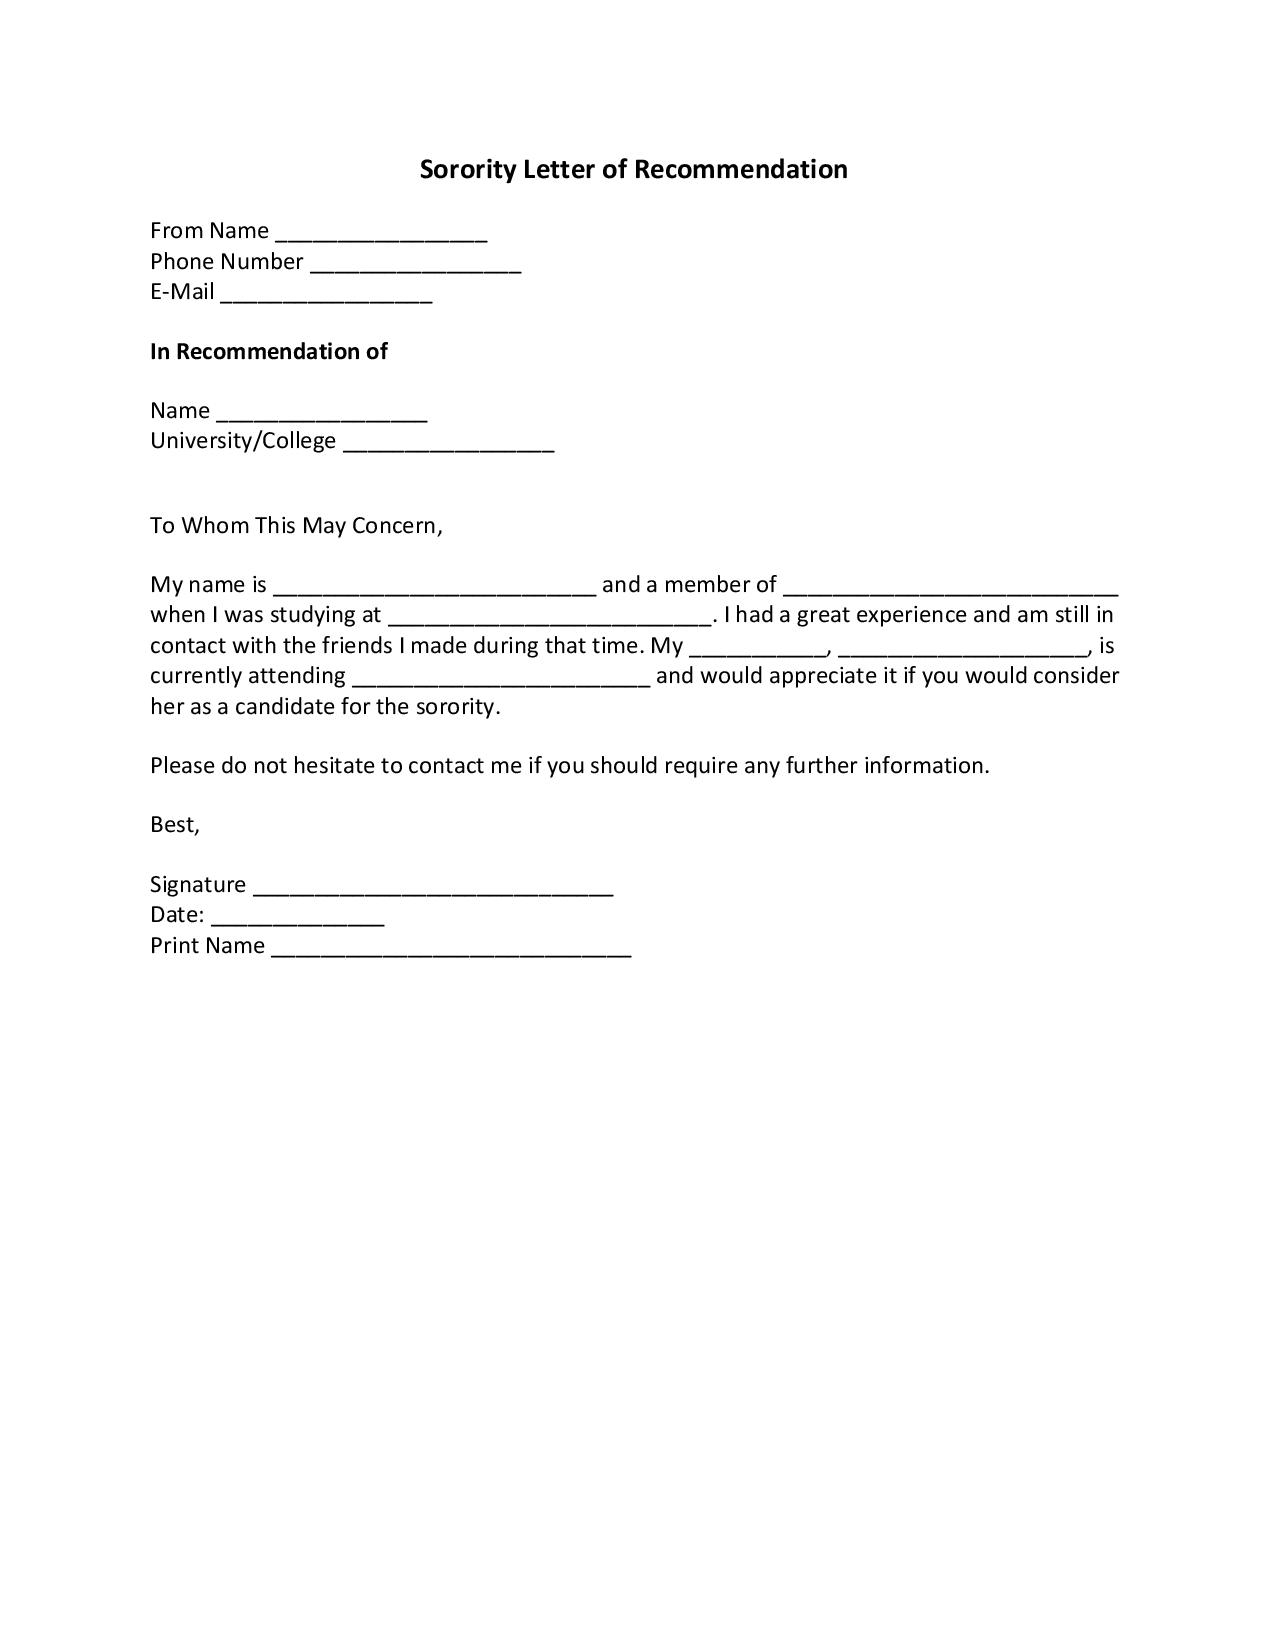 sororityrecommendationletterpage001